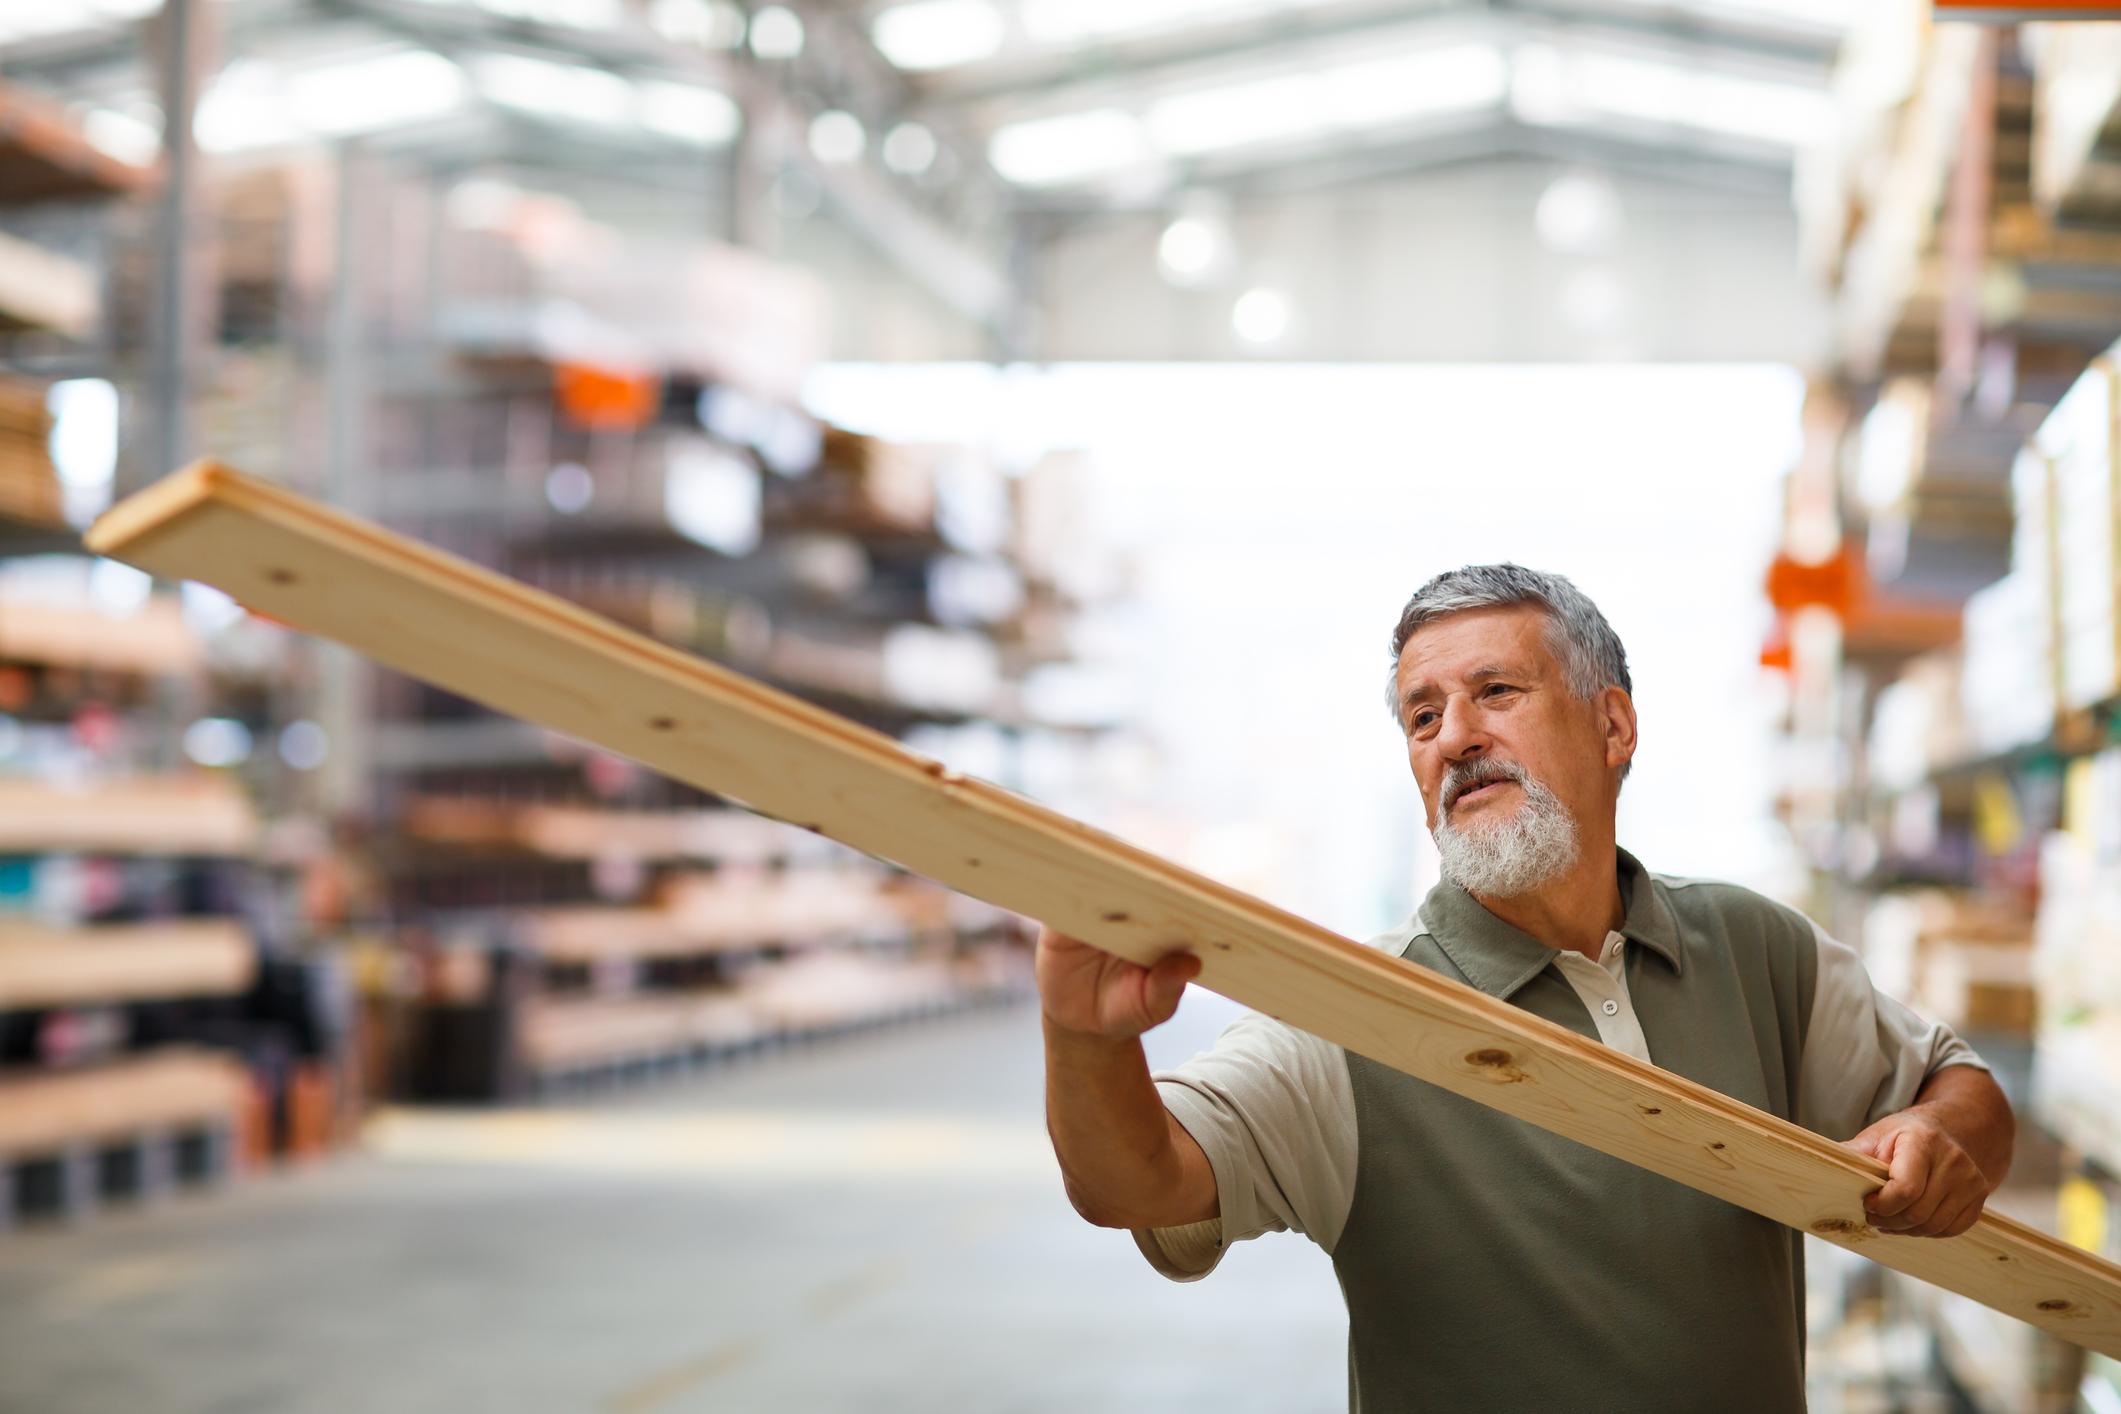 A man inspects a piece of lumber.